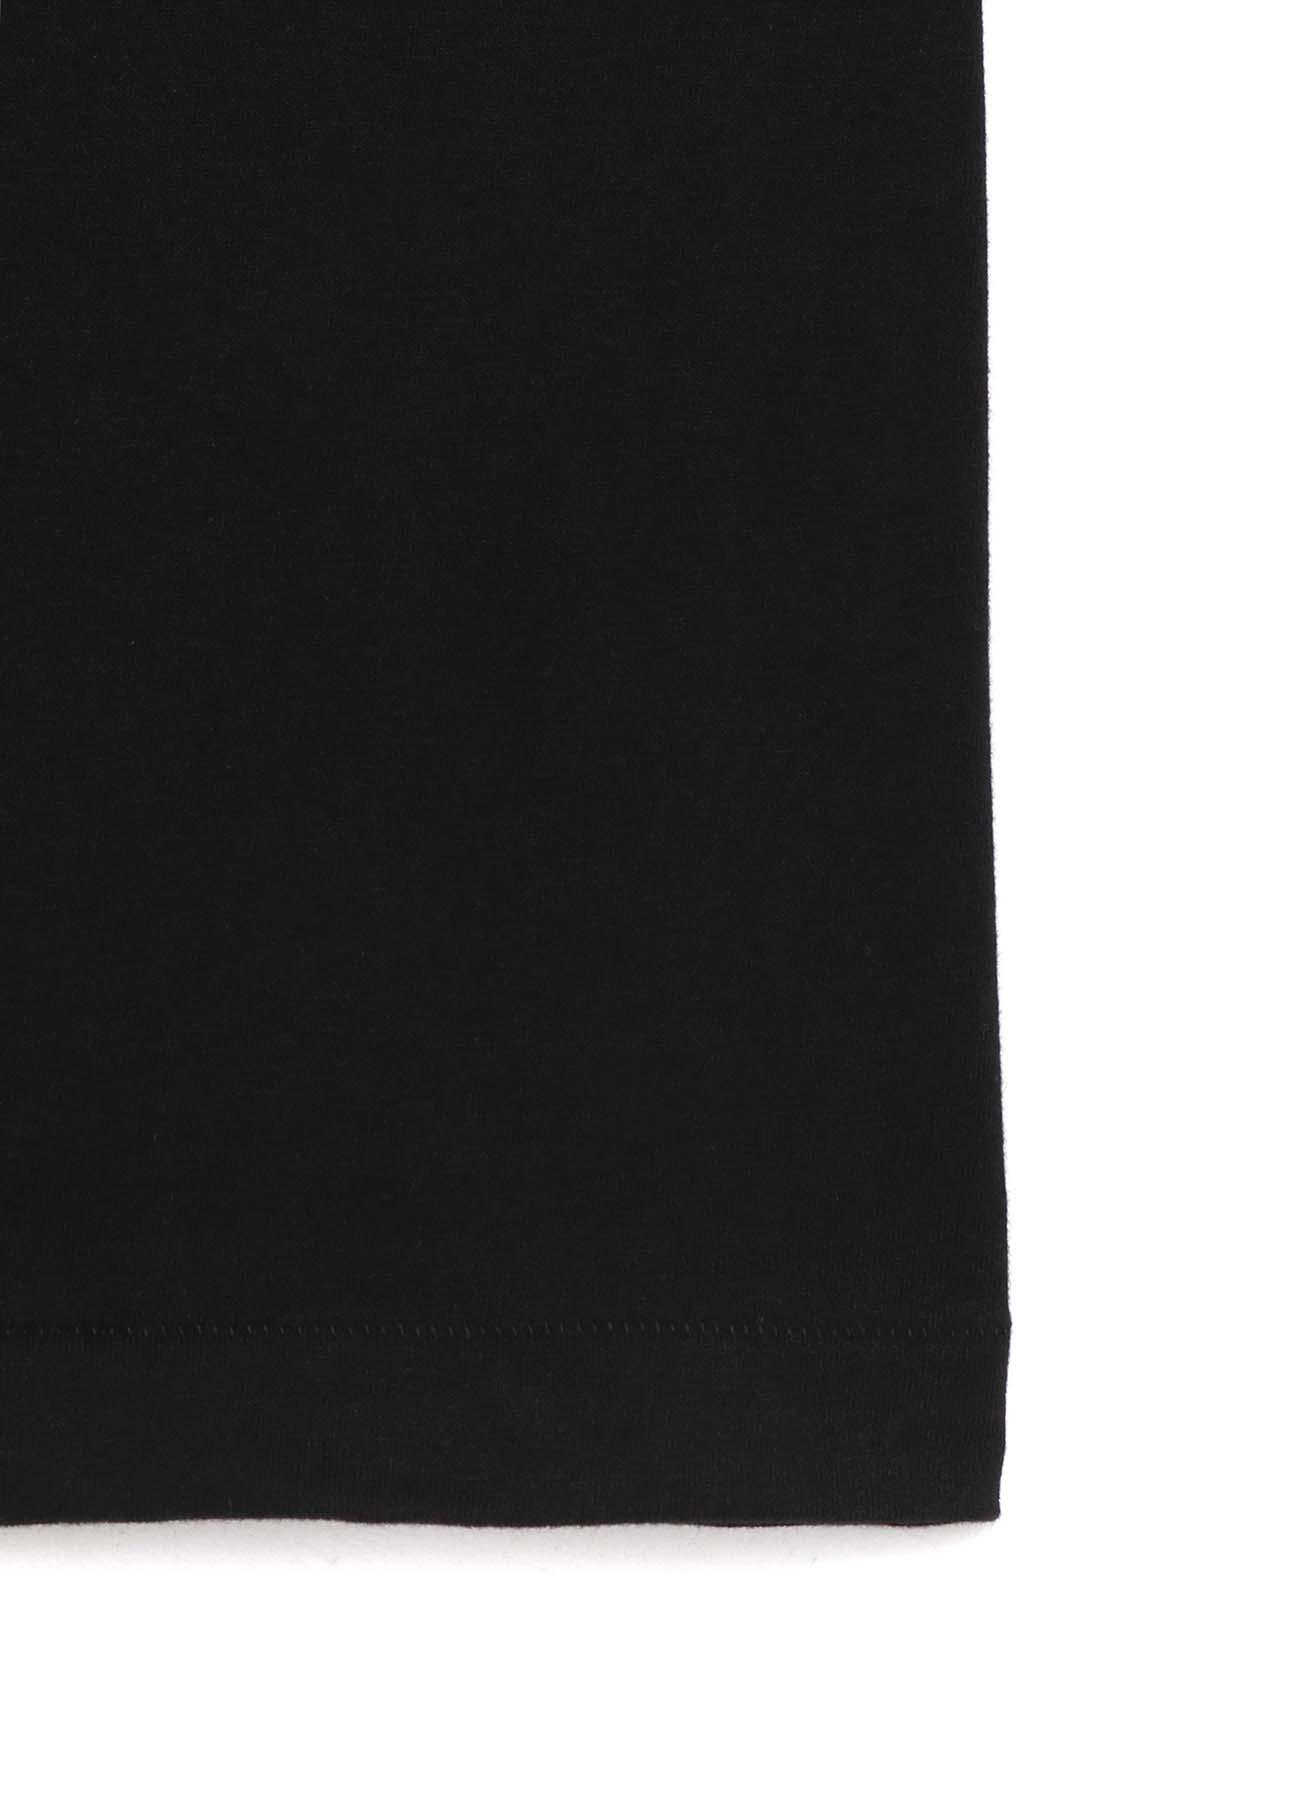 Junji ITO Tomie A Group Long Sleeve T-shirt